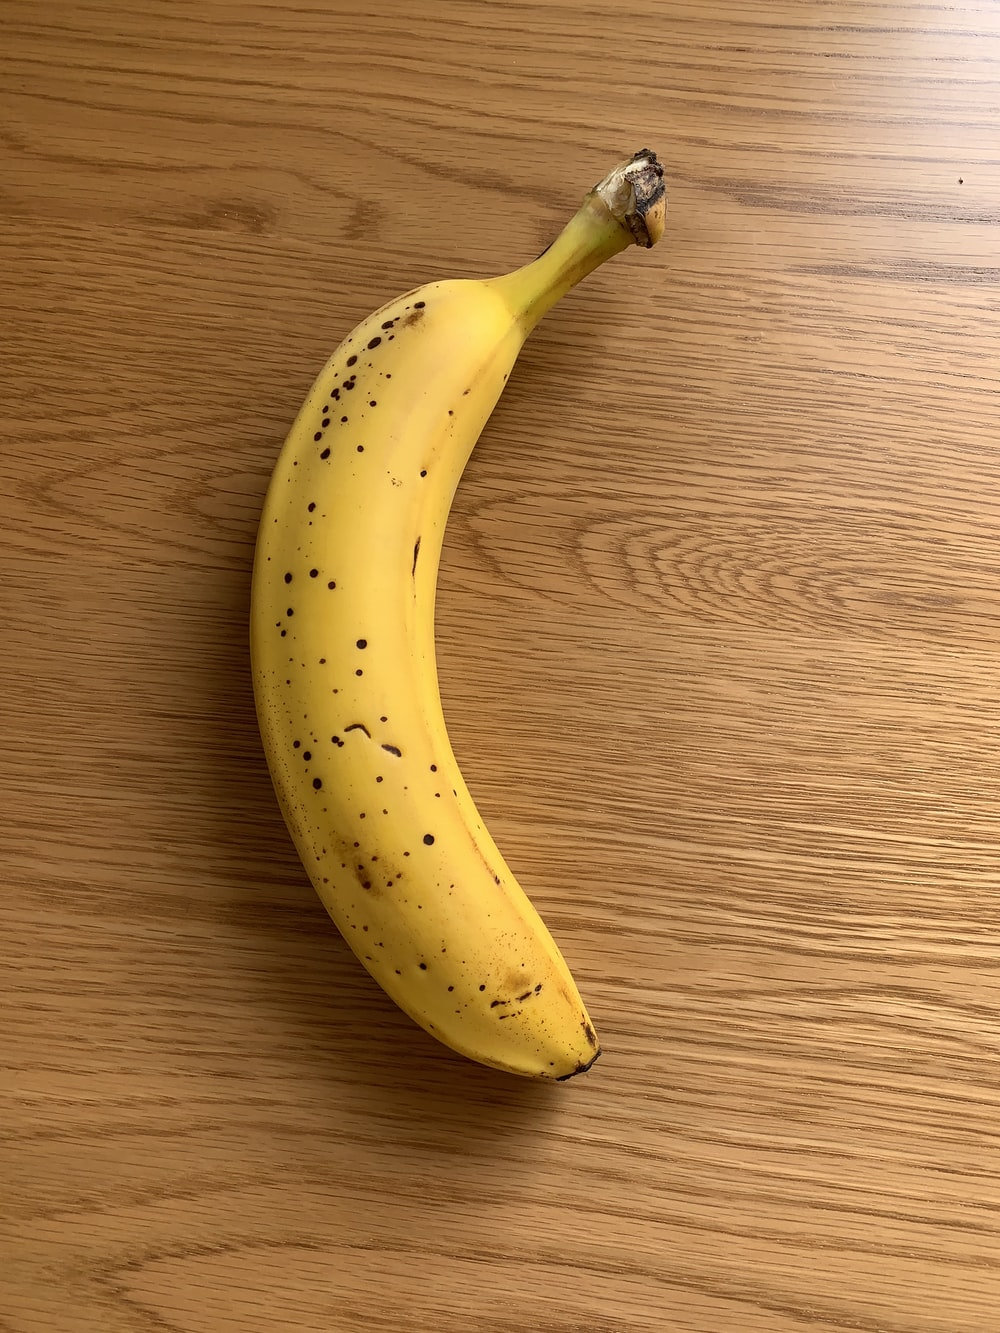 yellow banana fruit on brown wooden table